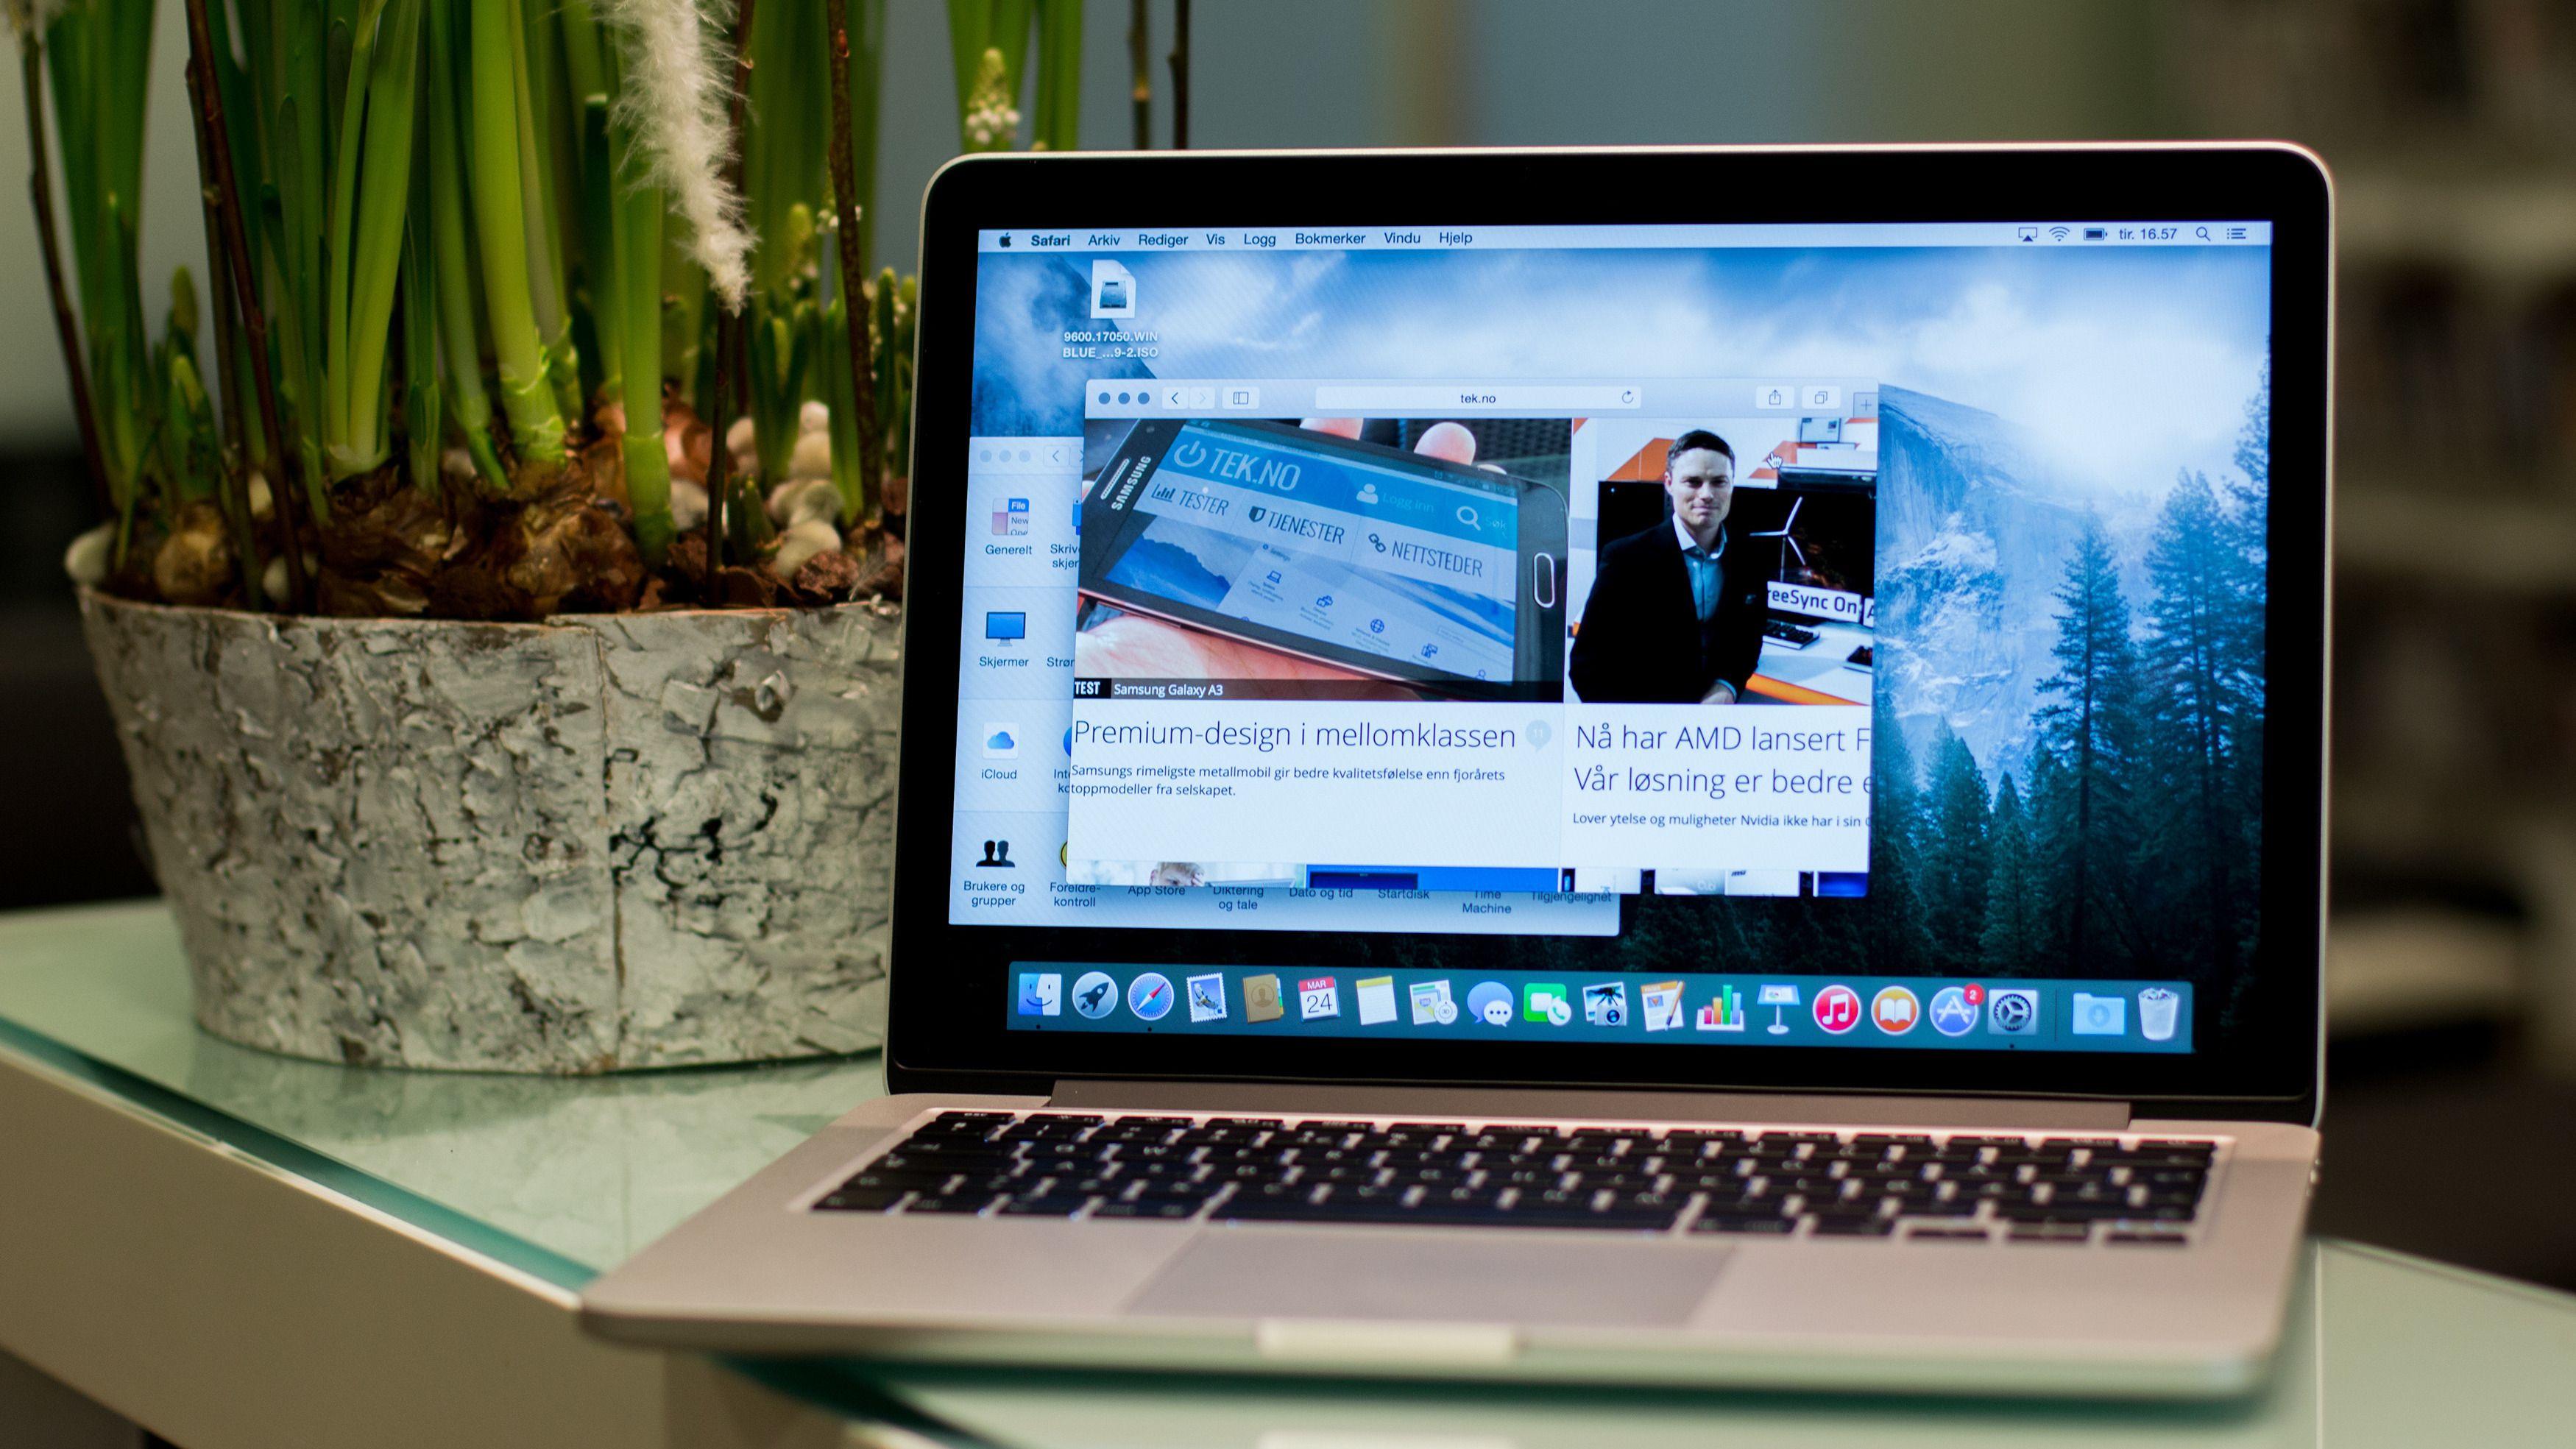 Apple MacBook Pro Retina 13 (Tidlig 2015)